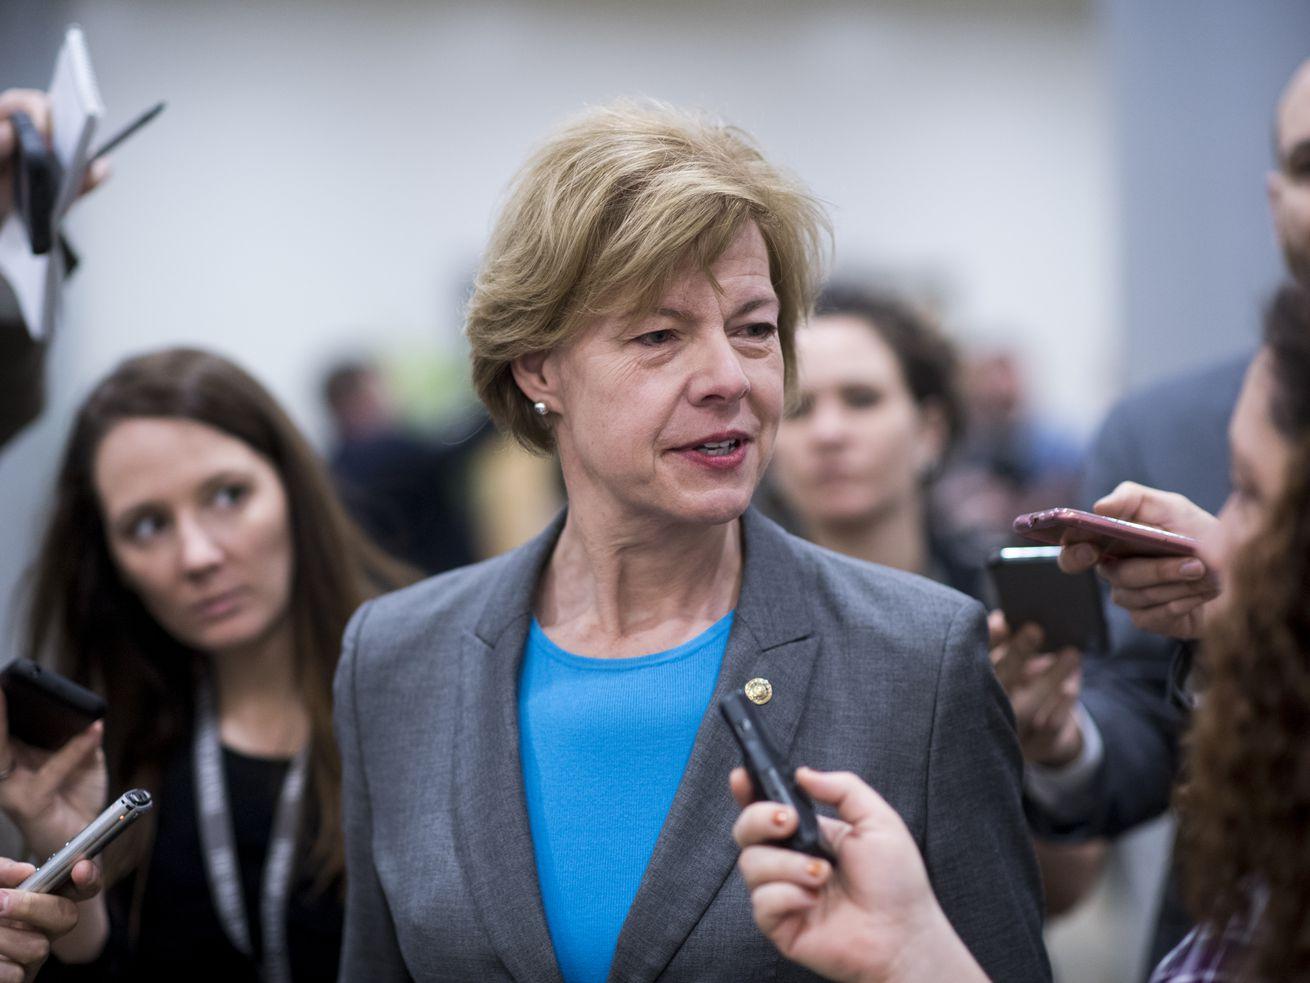 Sen. Tammy Baldwin (D-WI) wants to reverse Trump's expansion of short-term insurance plans.